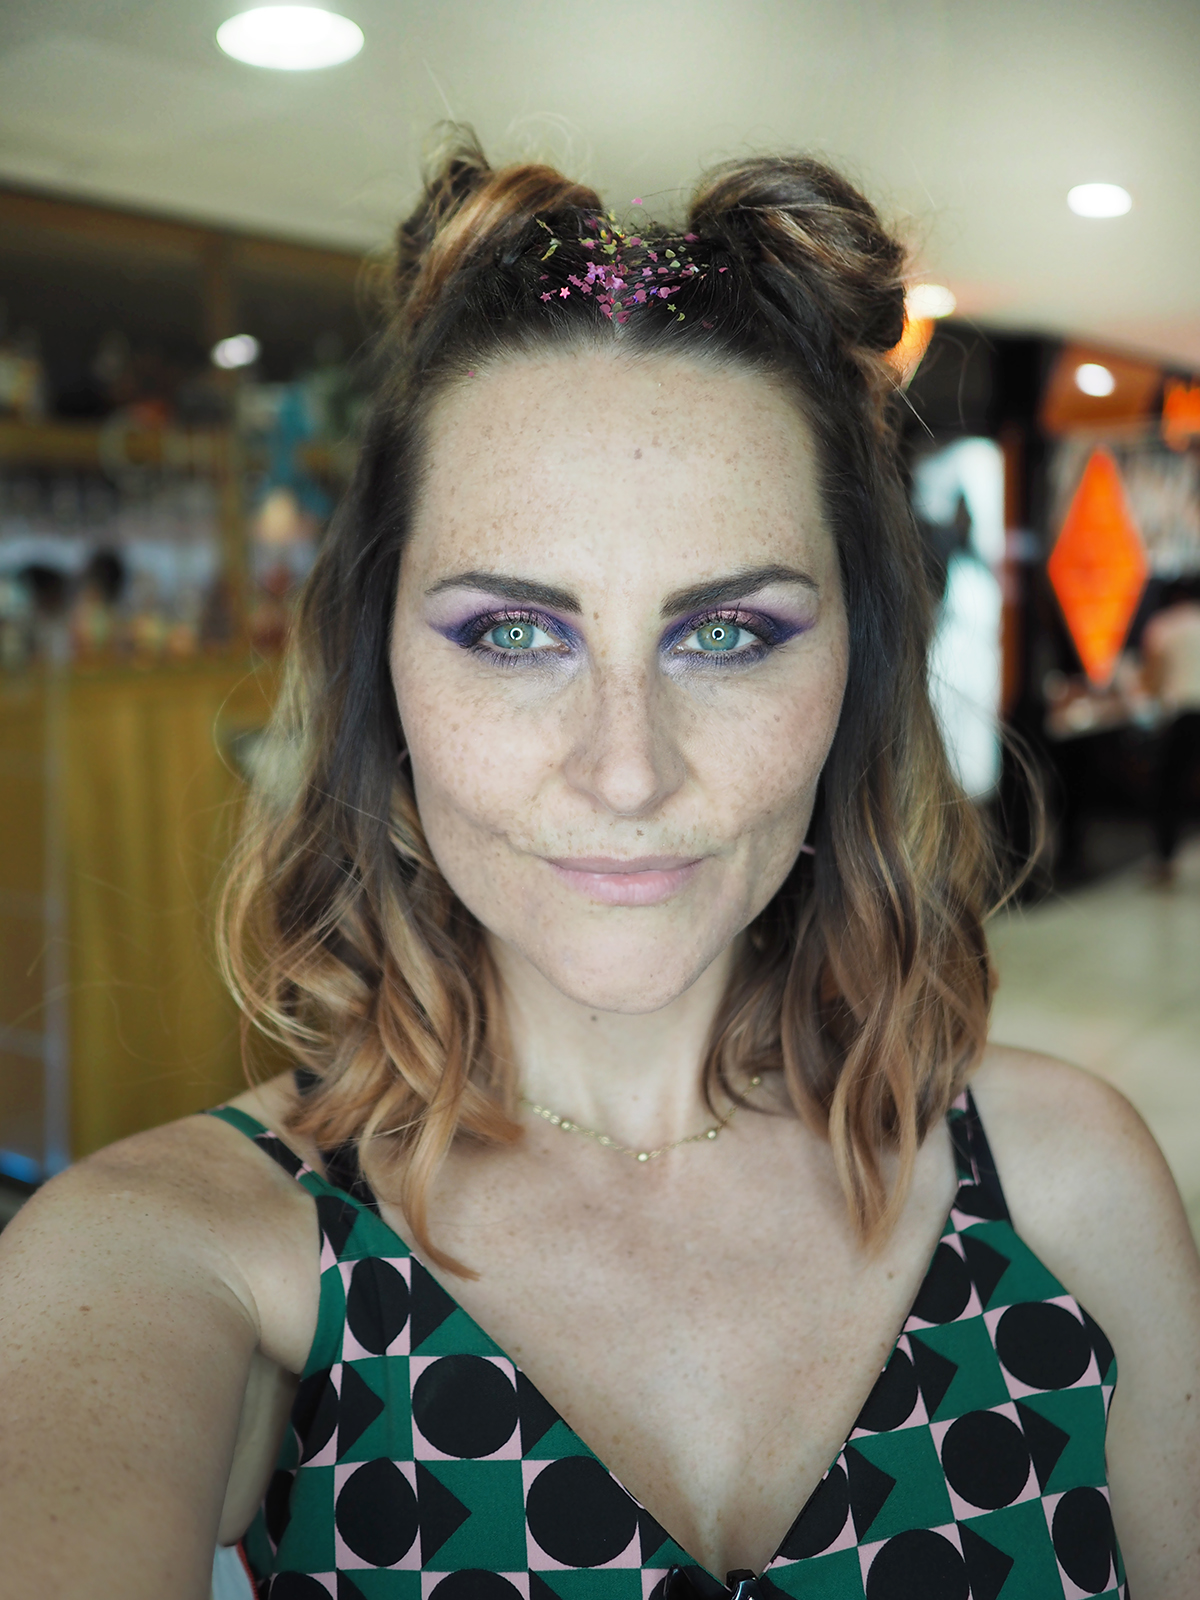 space bun hair with glitter festival makeup